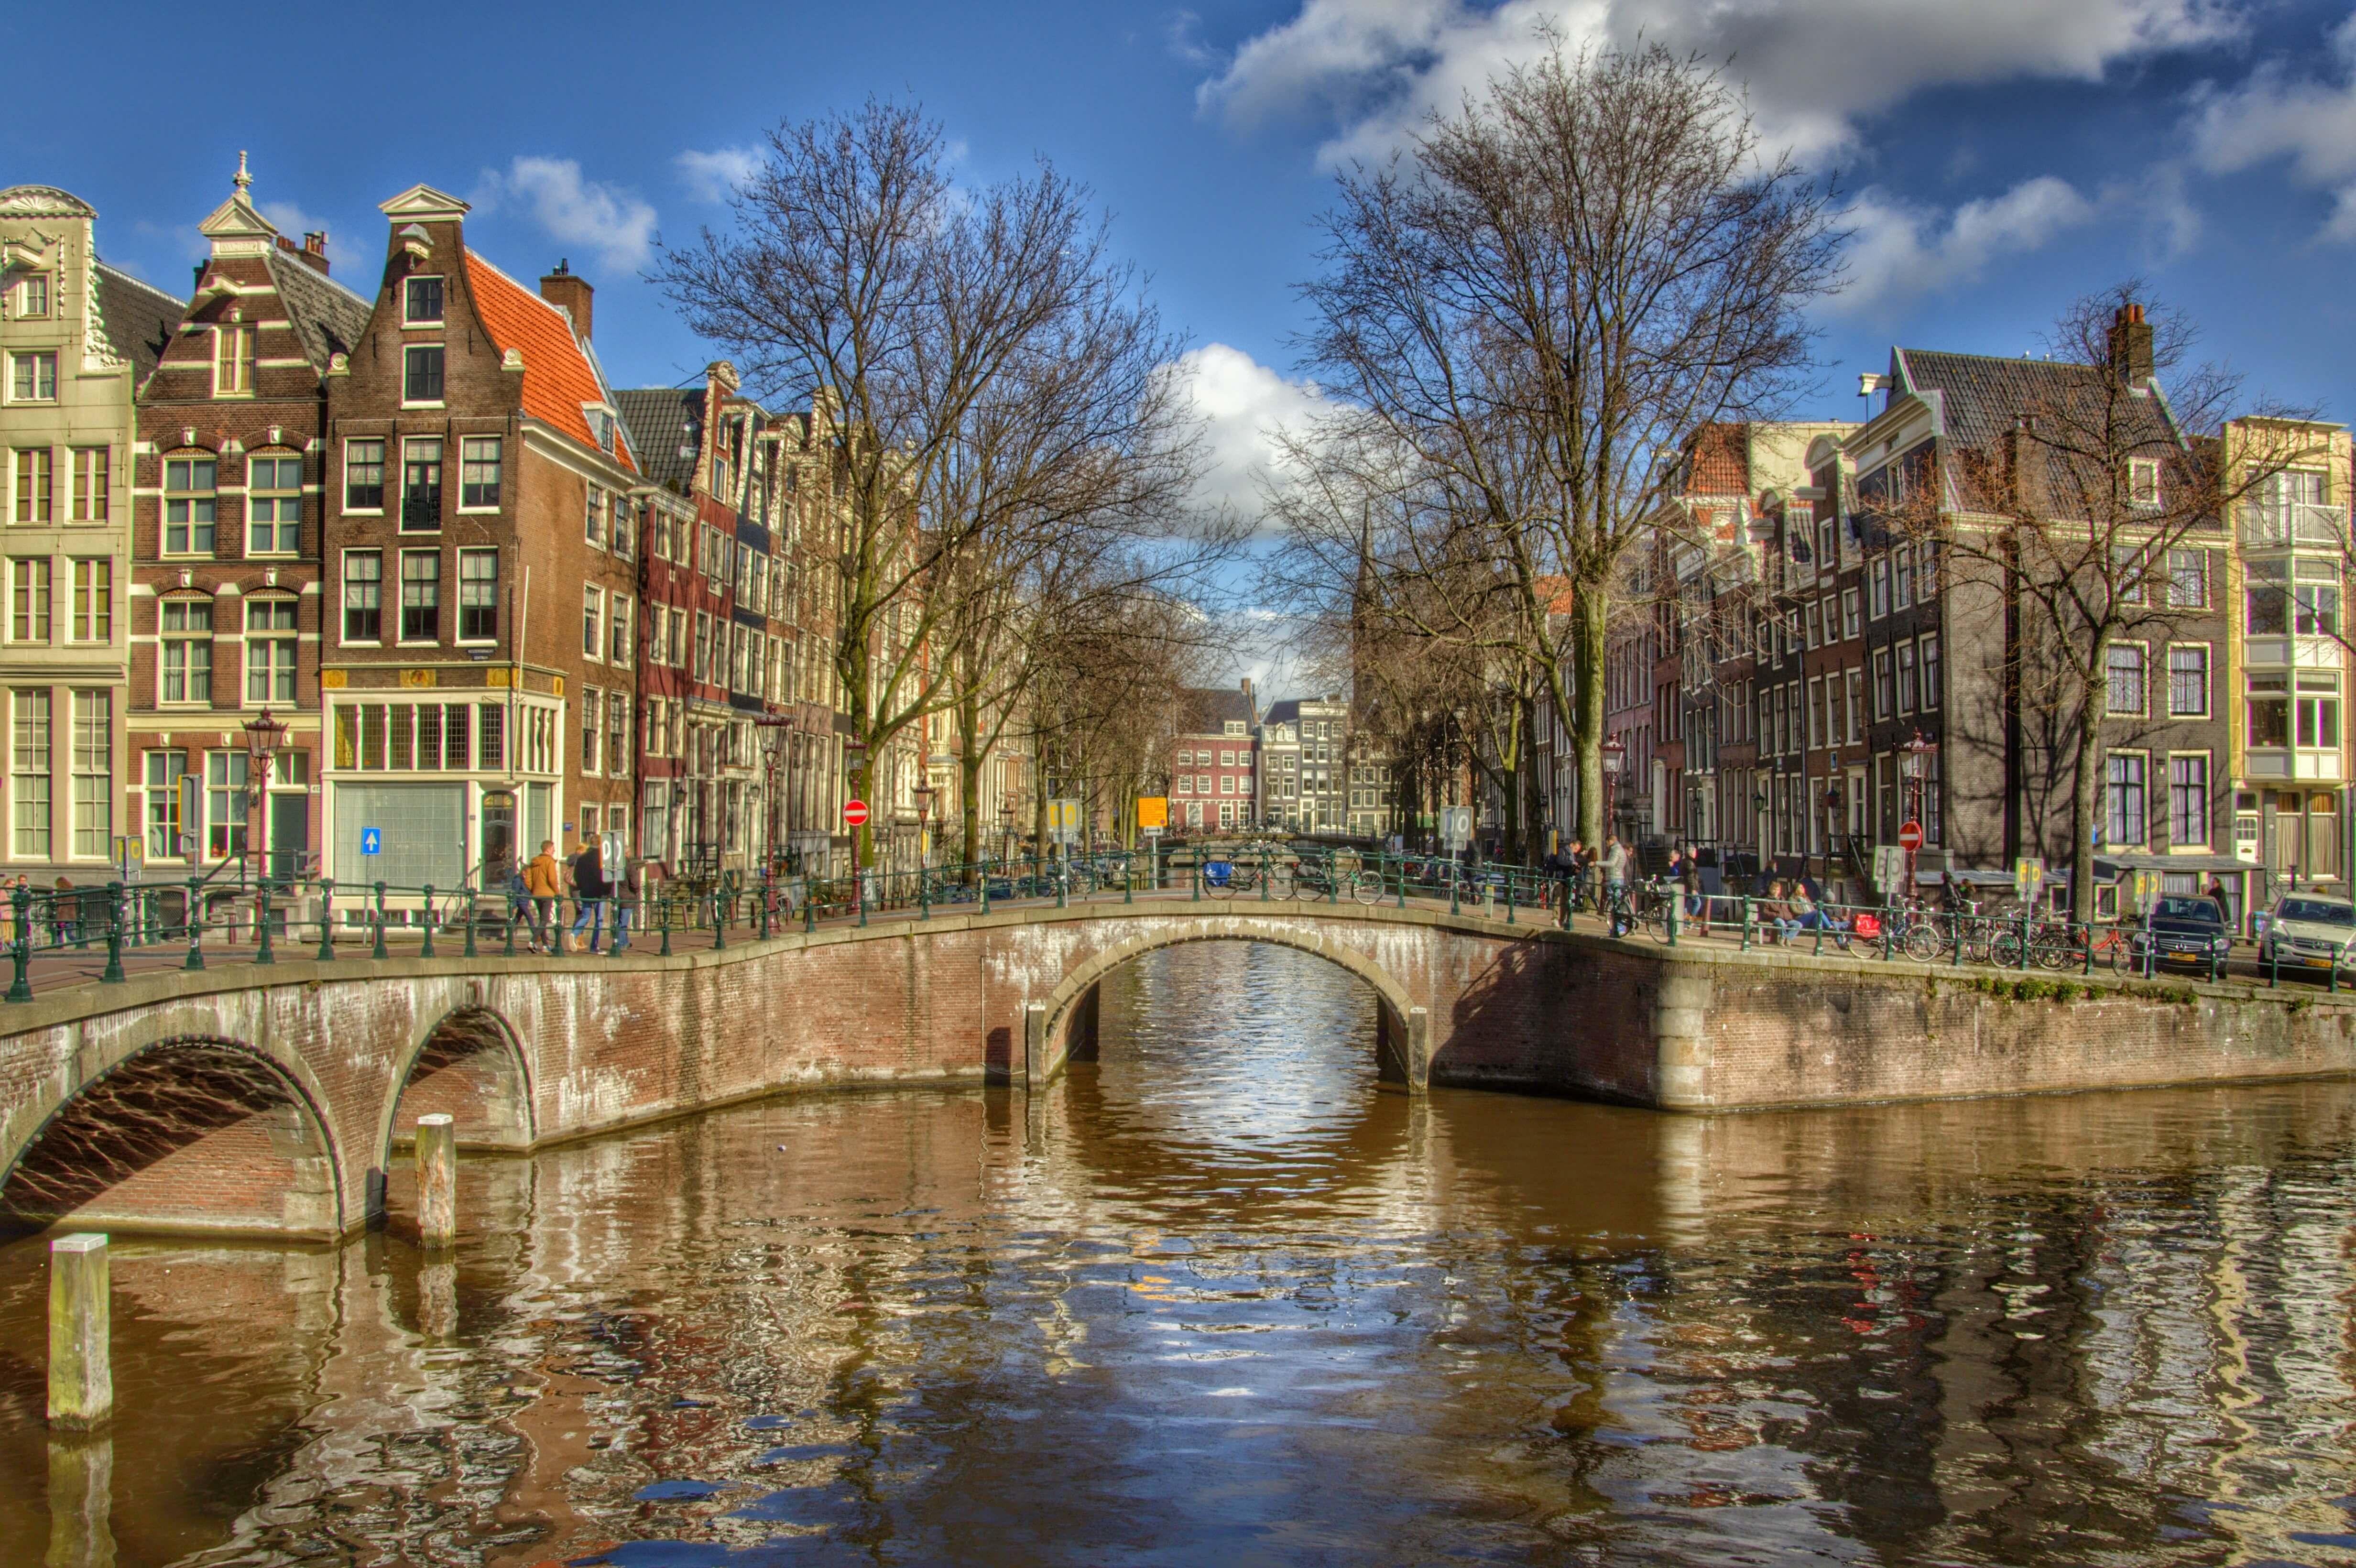 Holland Amsterdam / Foto: 0805edwin, pixabay